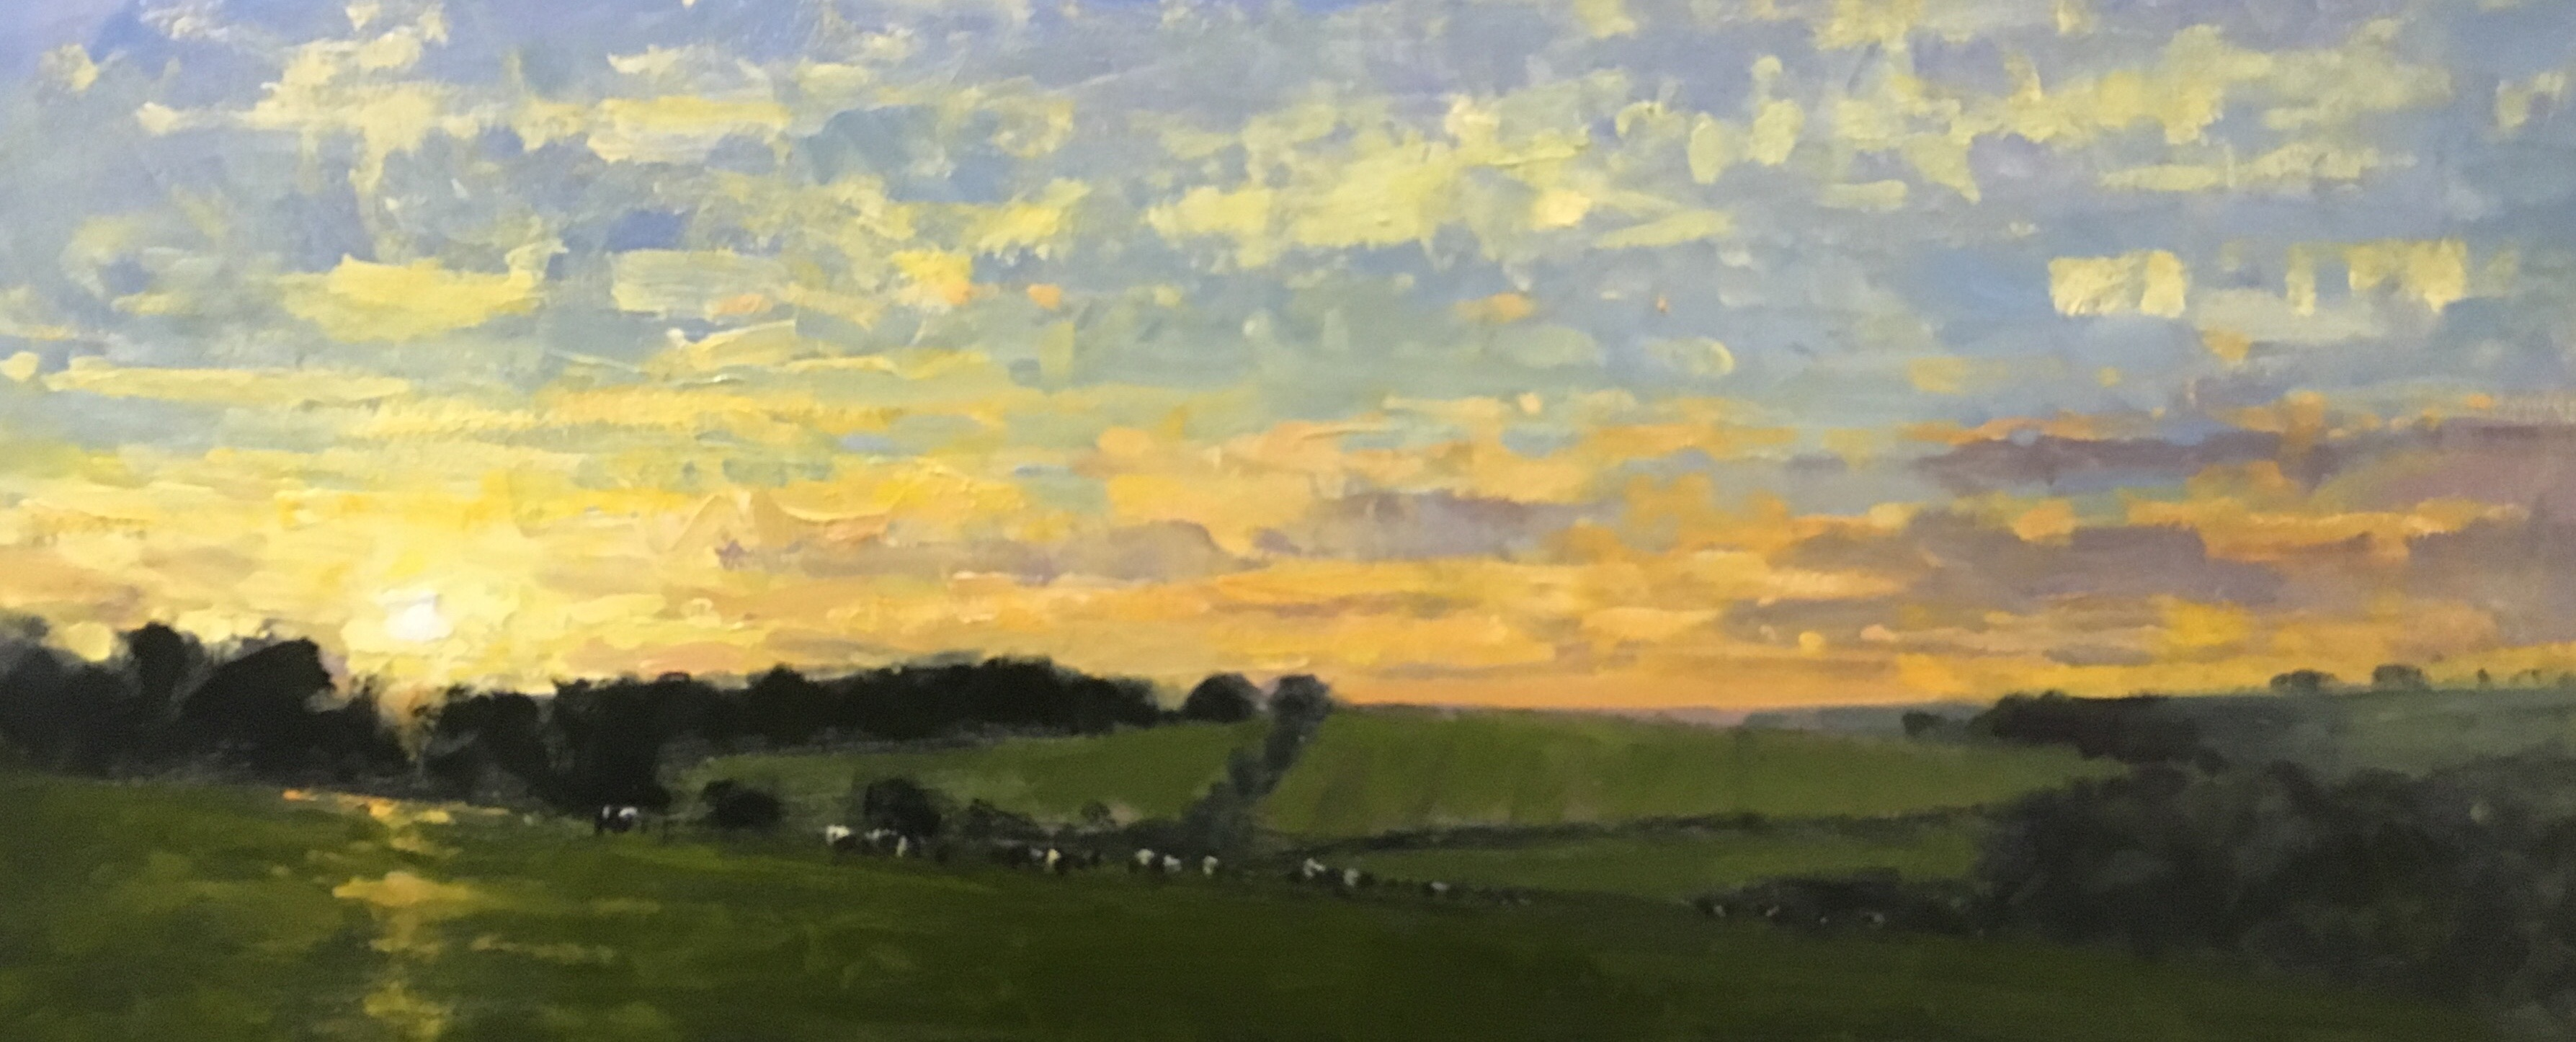 Sunset at Poundbury Hillfort